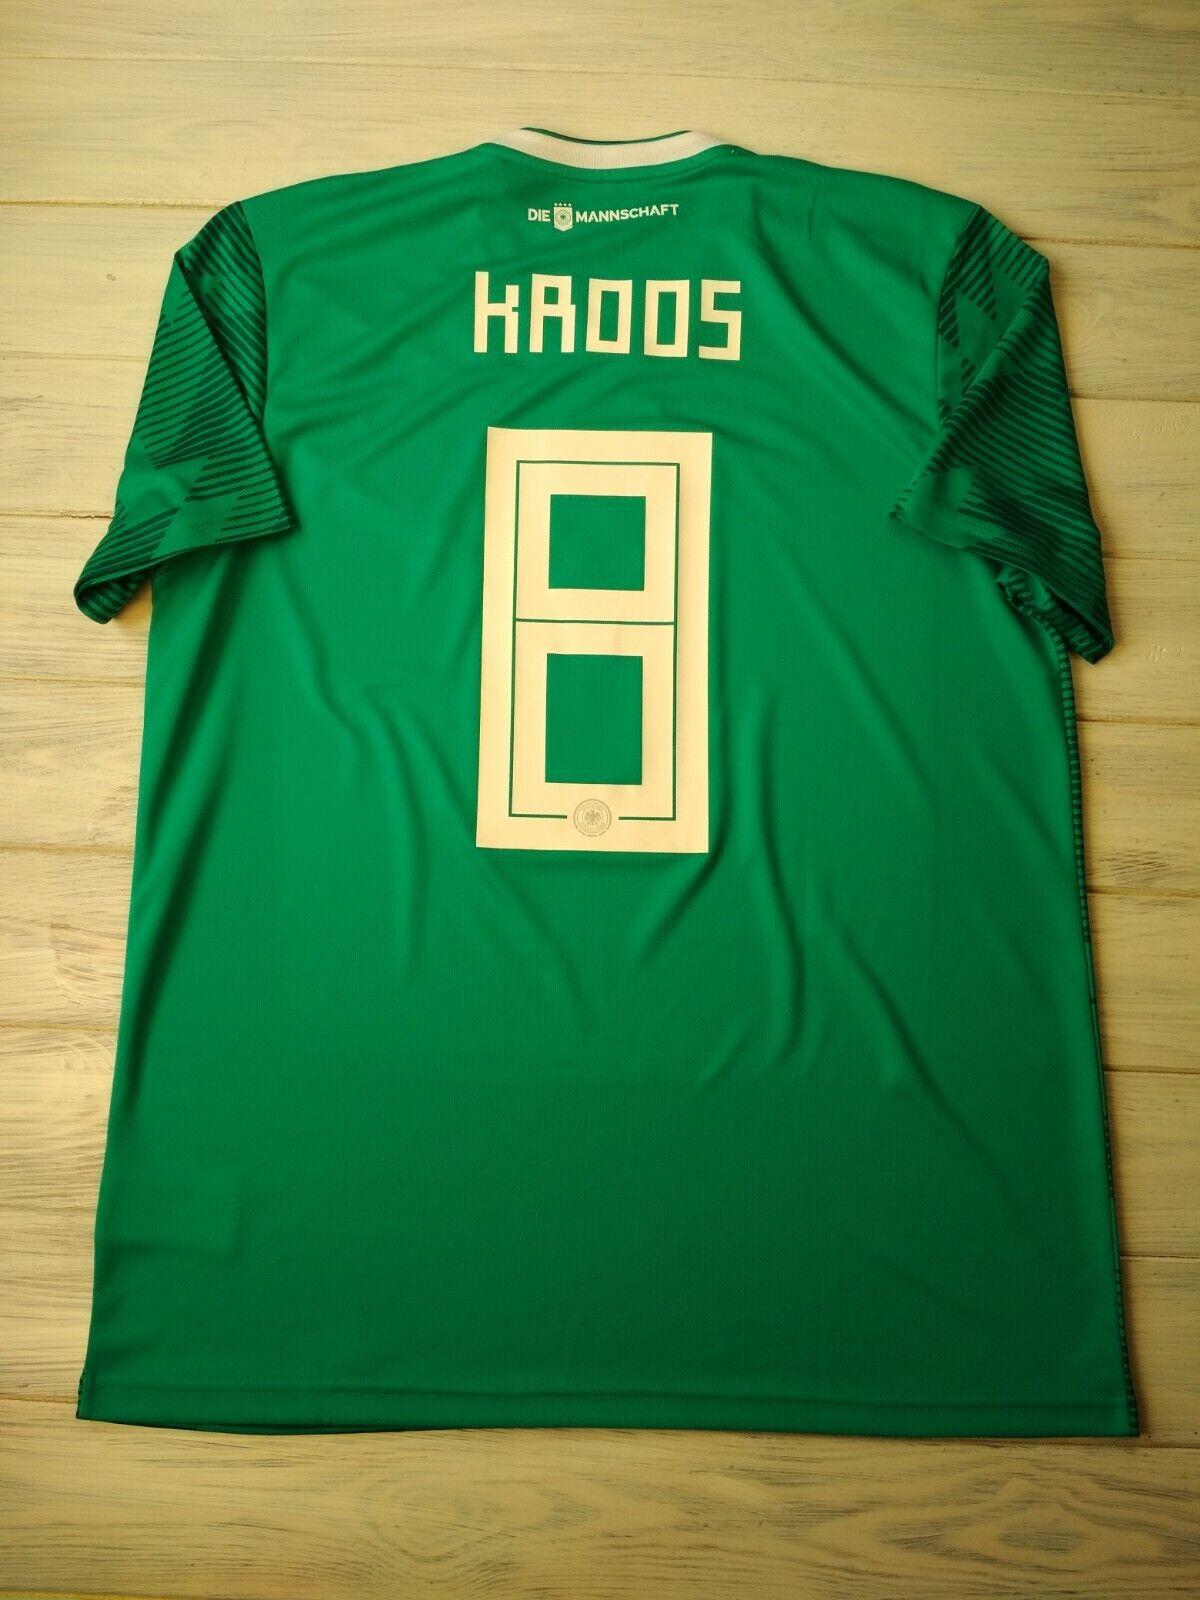 Kroos Geruomoy soccer jersey gree 2019 away shirt BR3144 soccer footbtutti Adidas